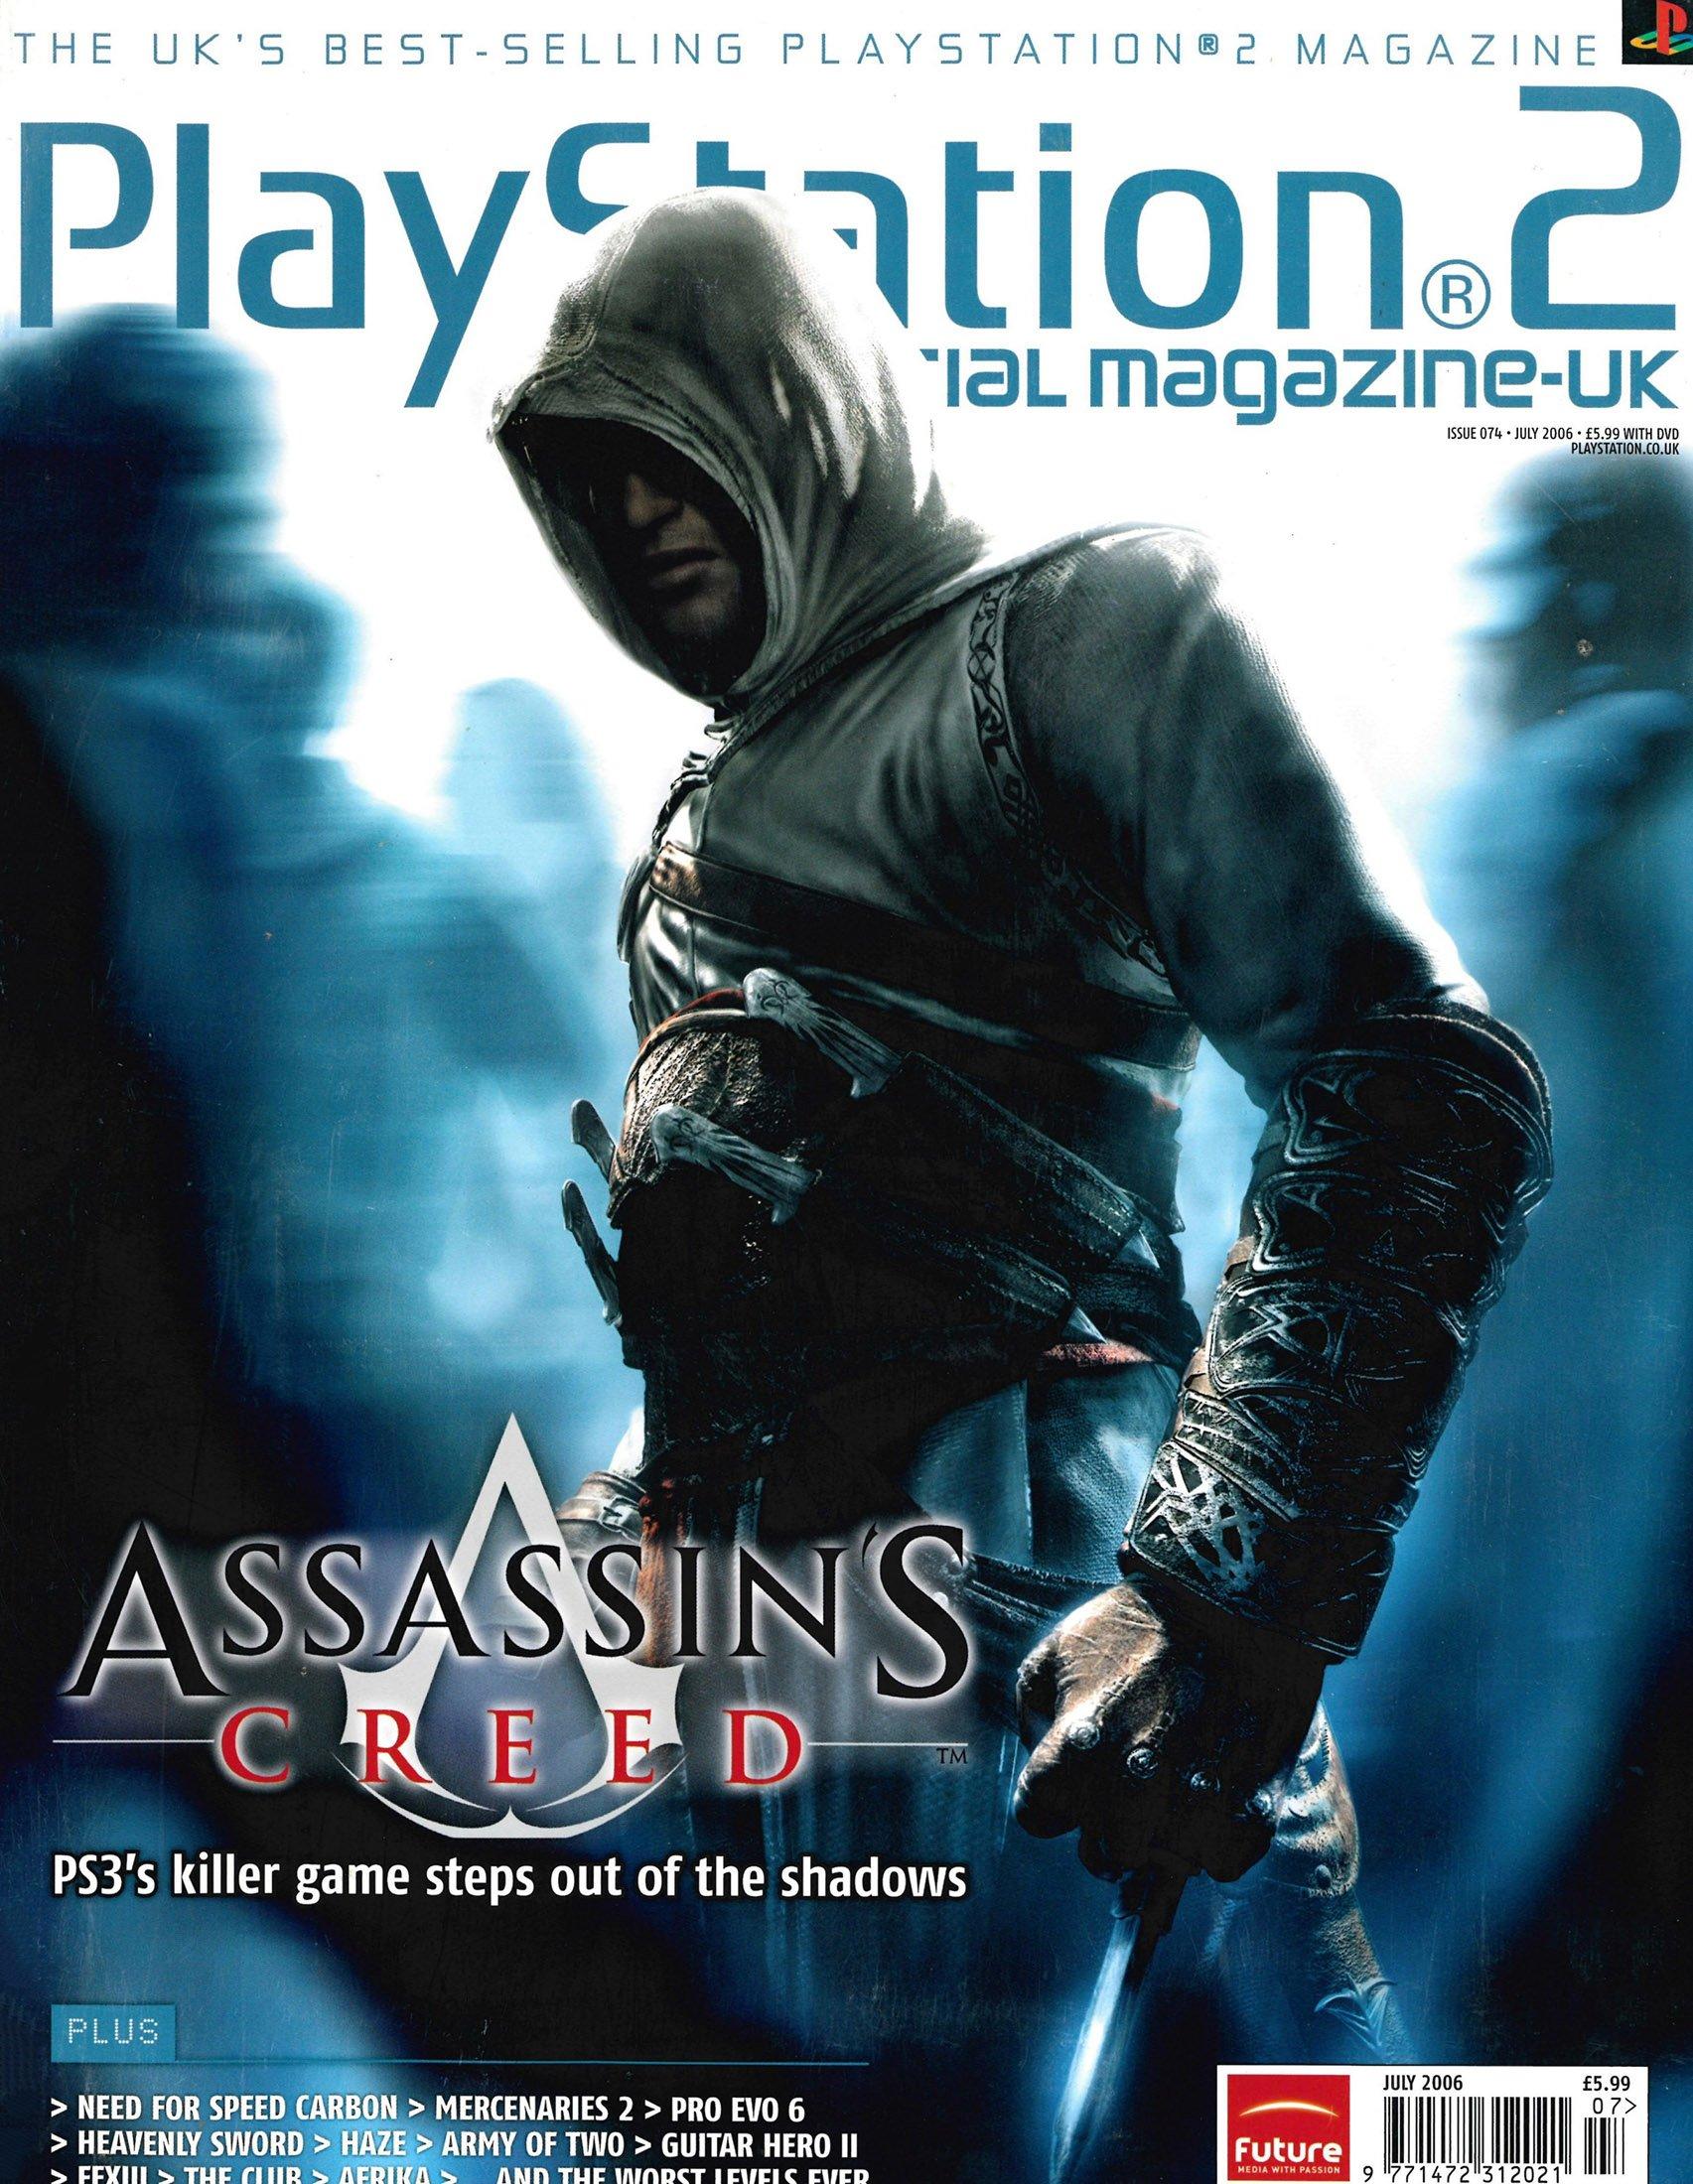 Official Playstation 2 Magazine UK 074 (July 2006)